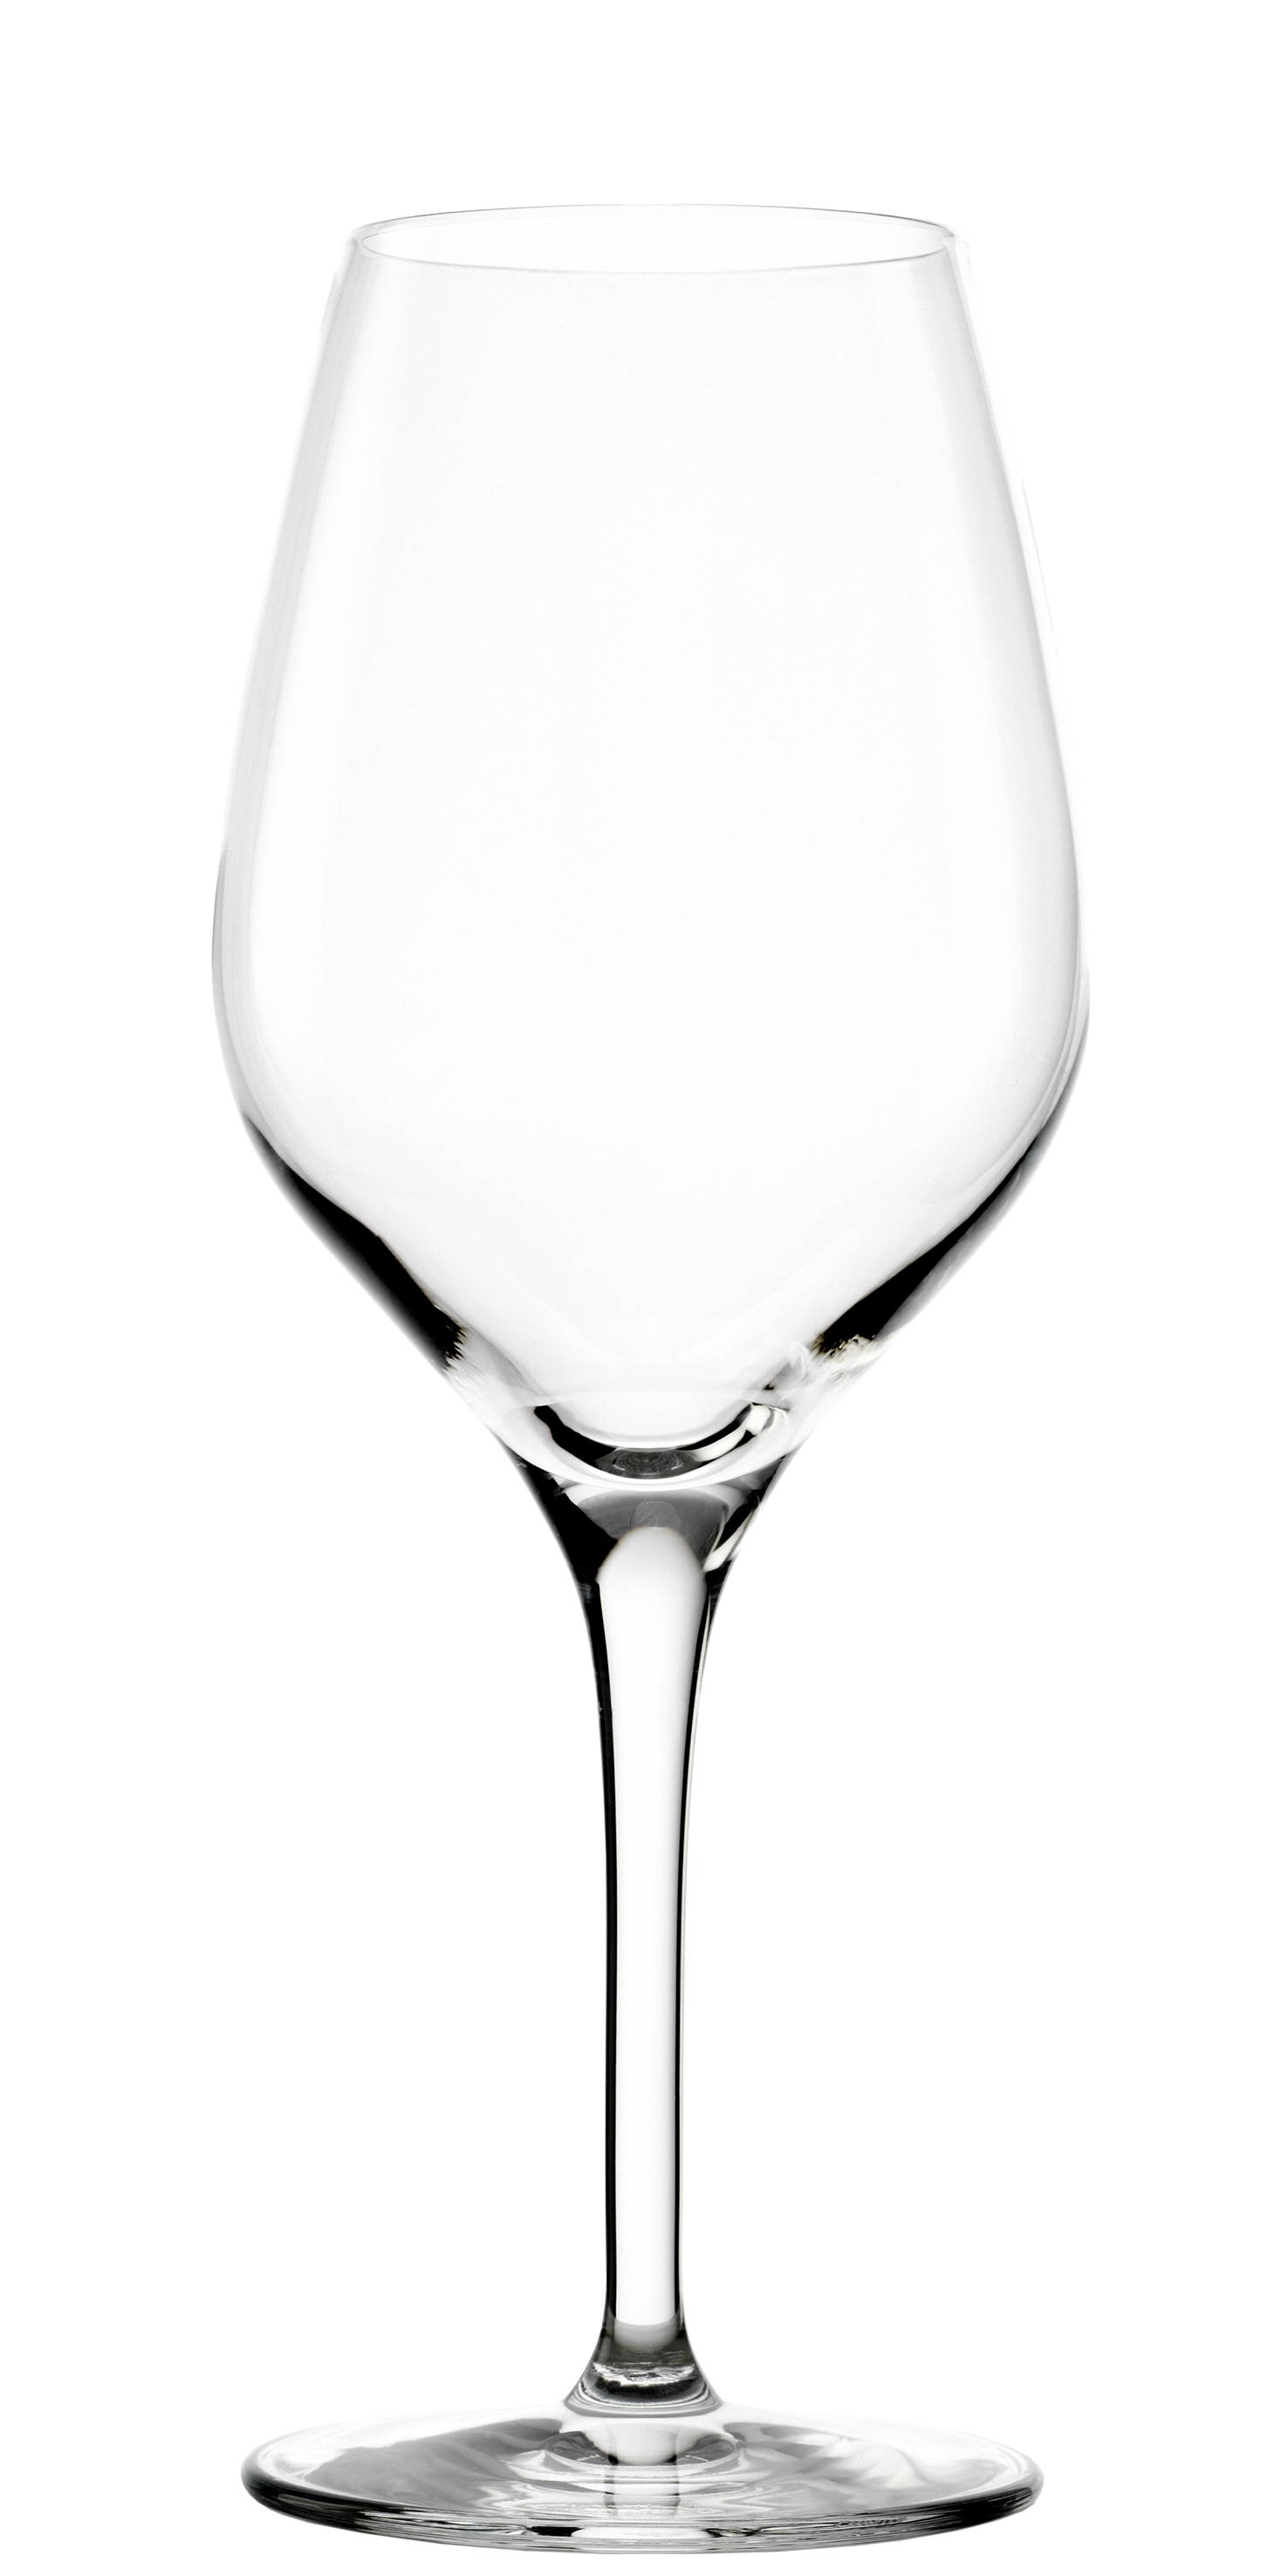 verre exquisit 35 cl